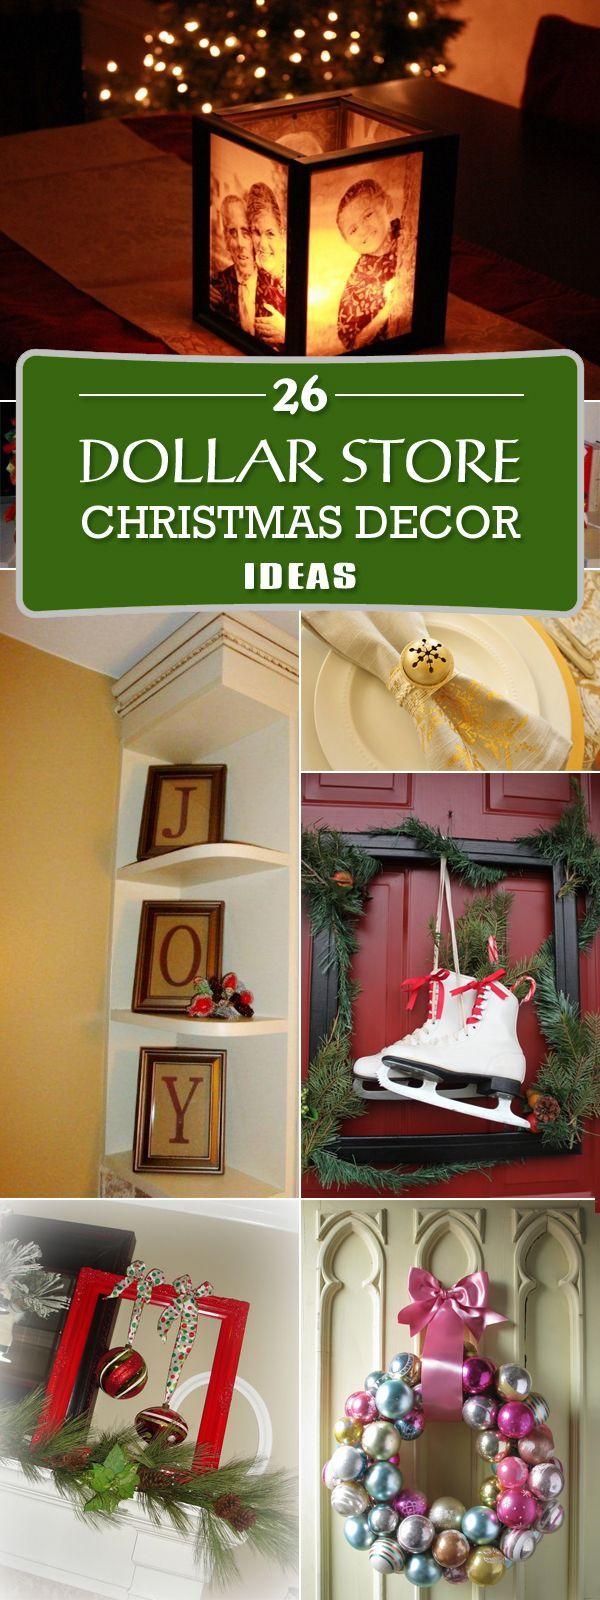 26 Dollar Store Christmas Decor Ideas Teen Stuff Room Ideas